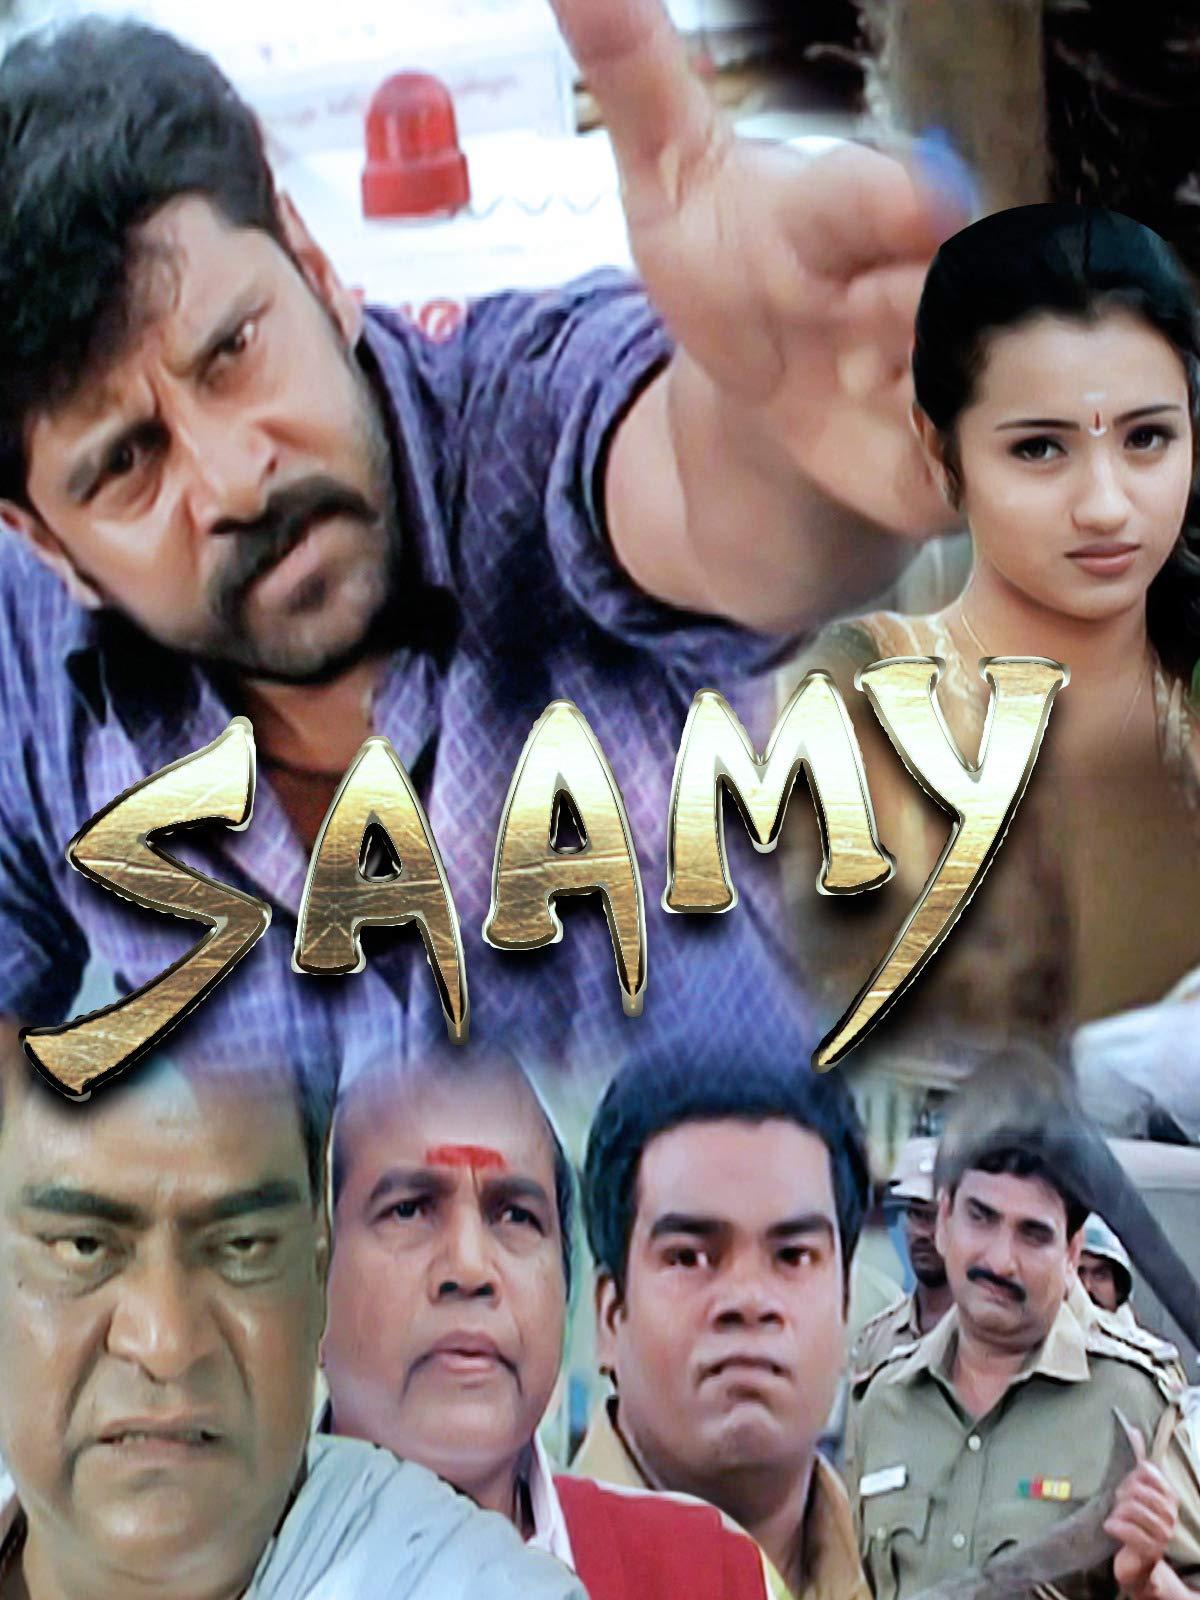 saamy hd video songs download